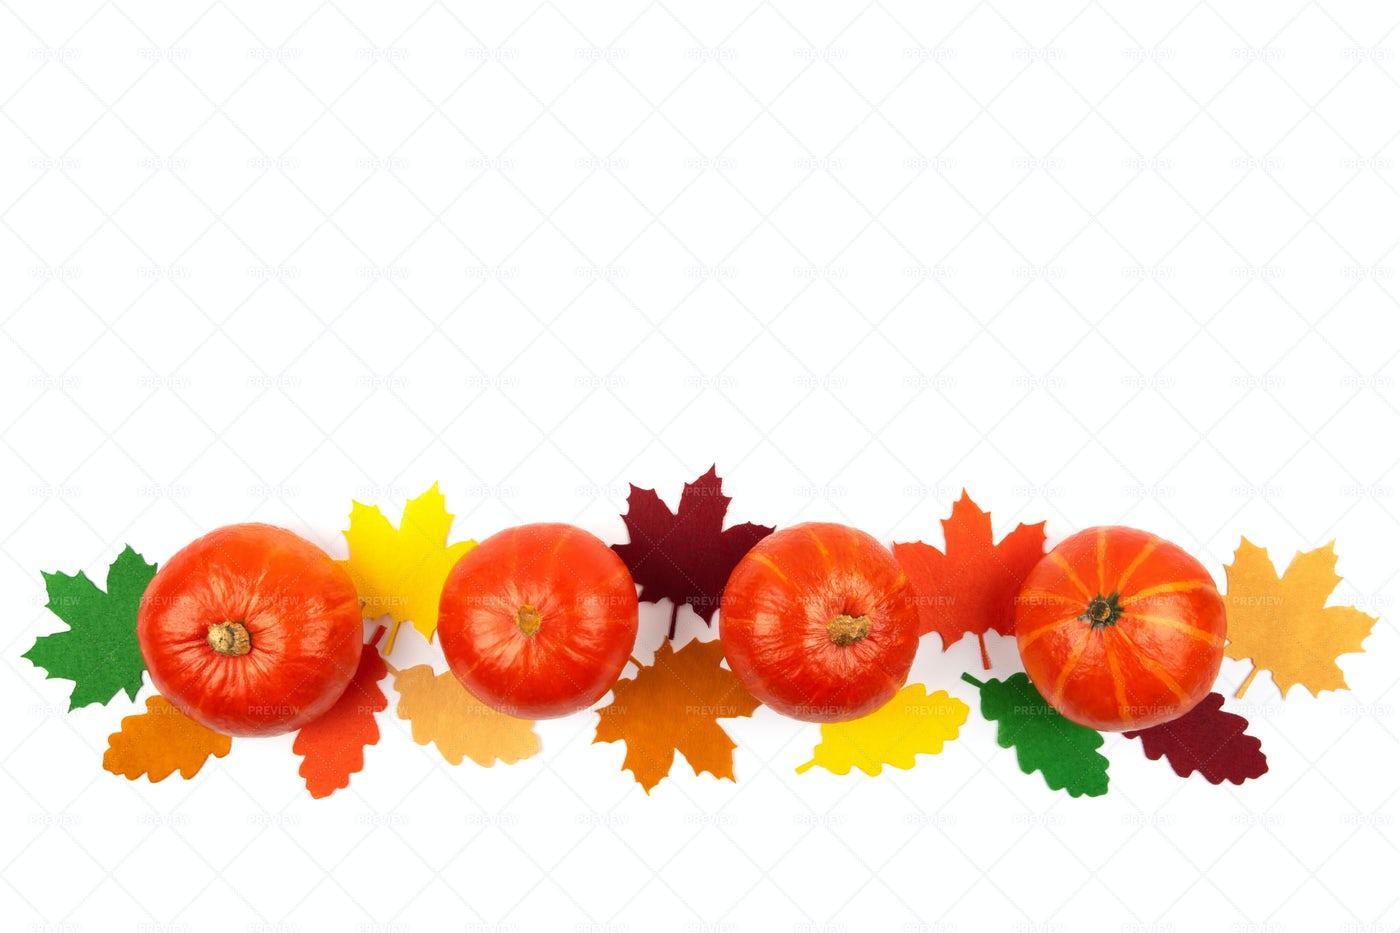 Orange Pumpkins And Leaves: Stock Photos